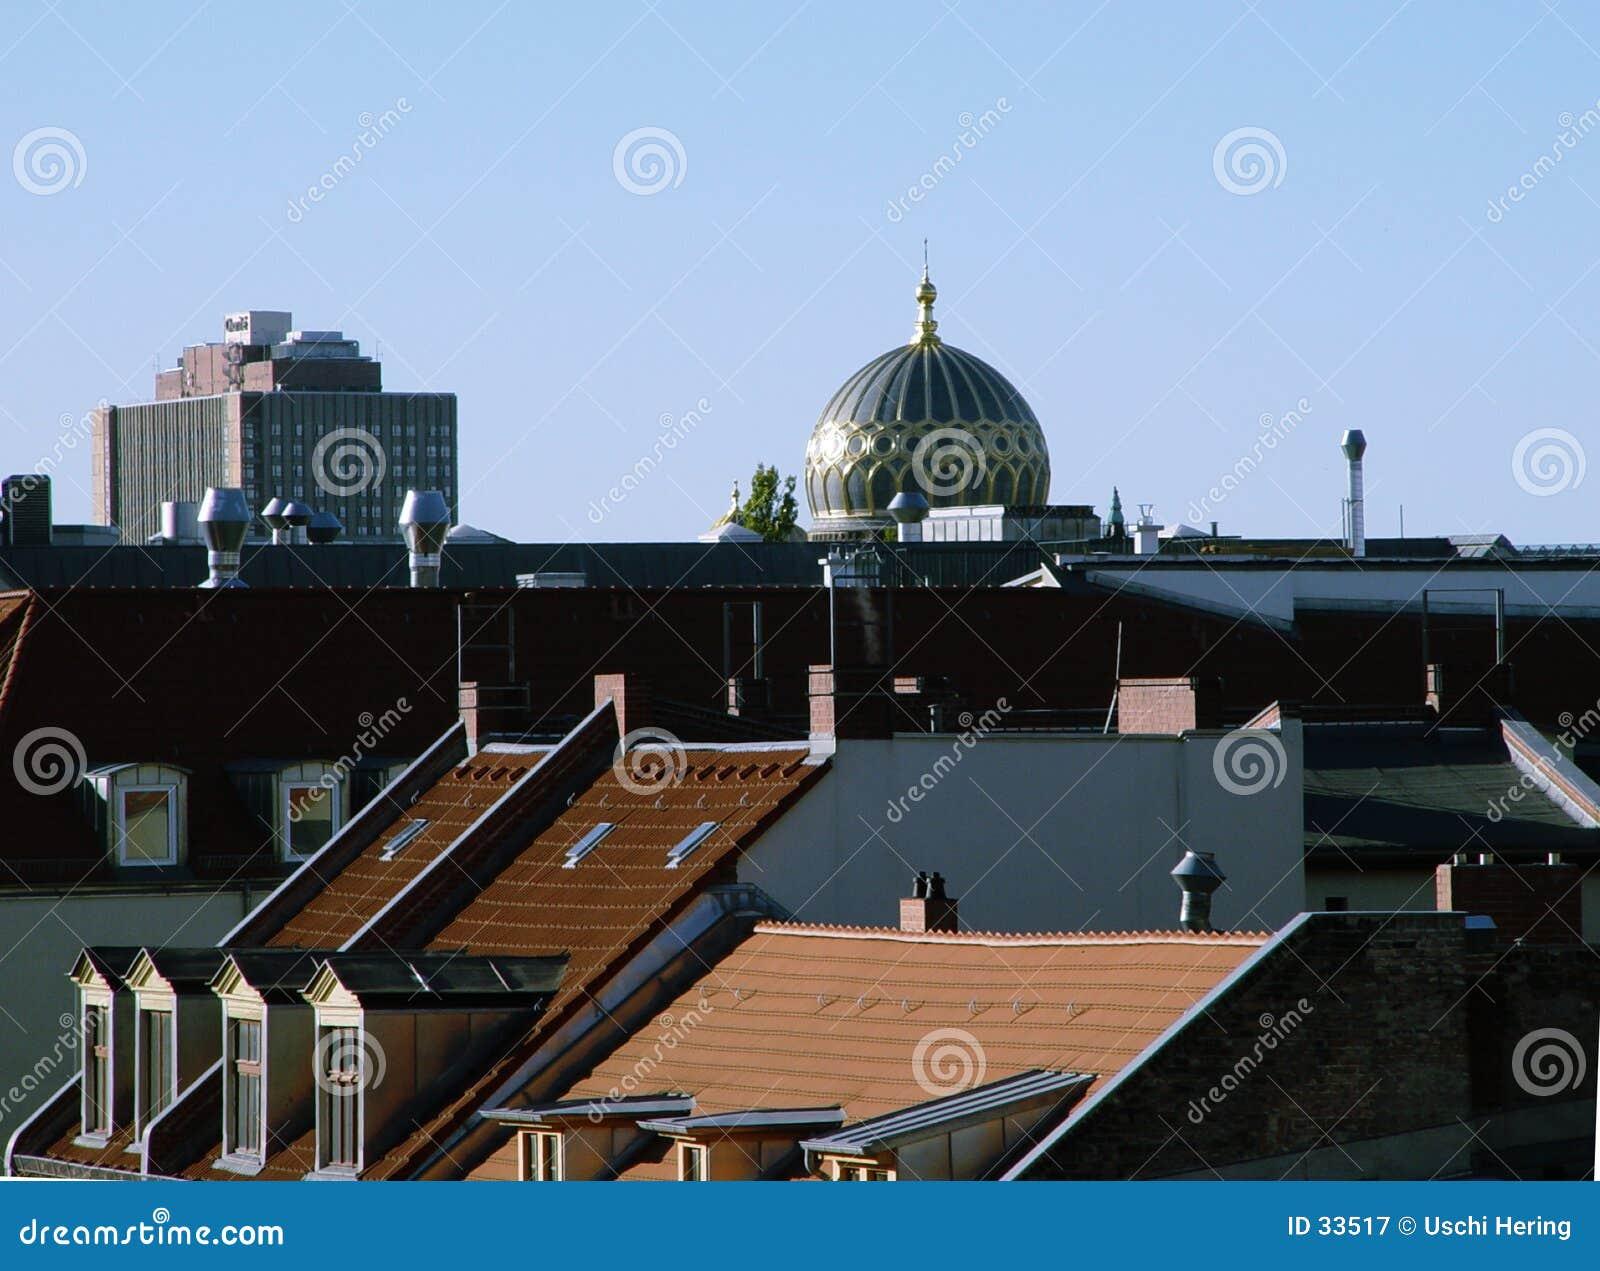 metropolitan roofs